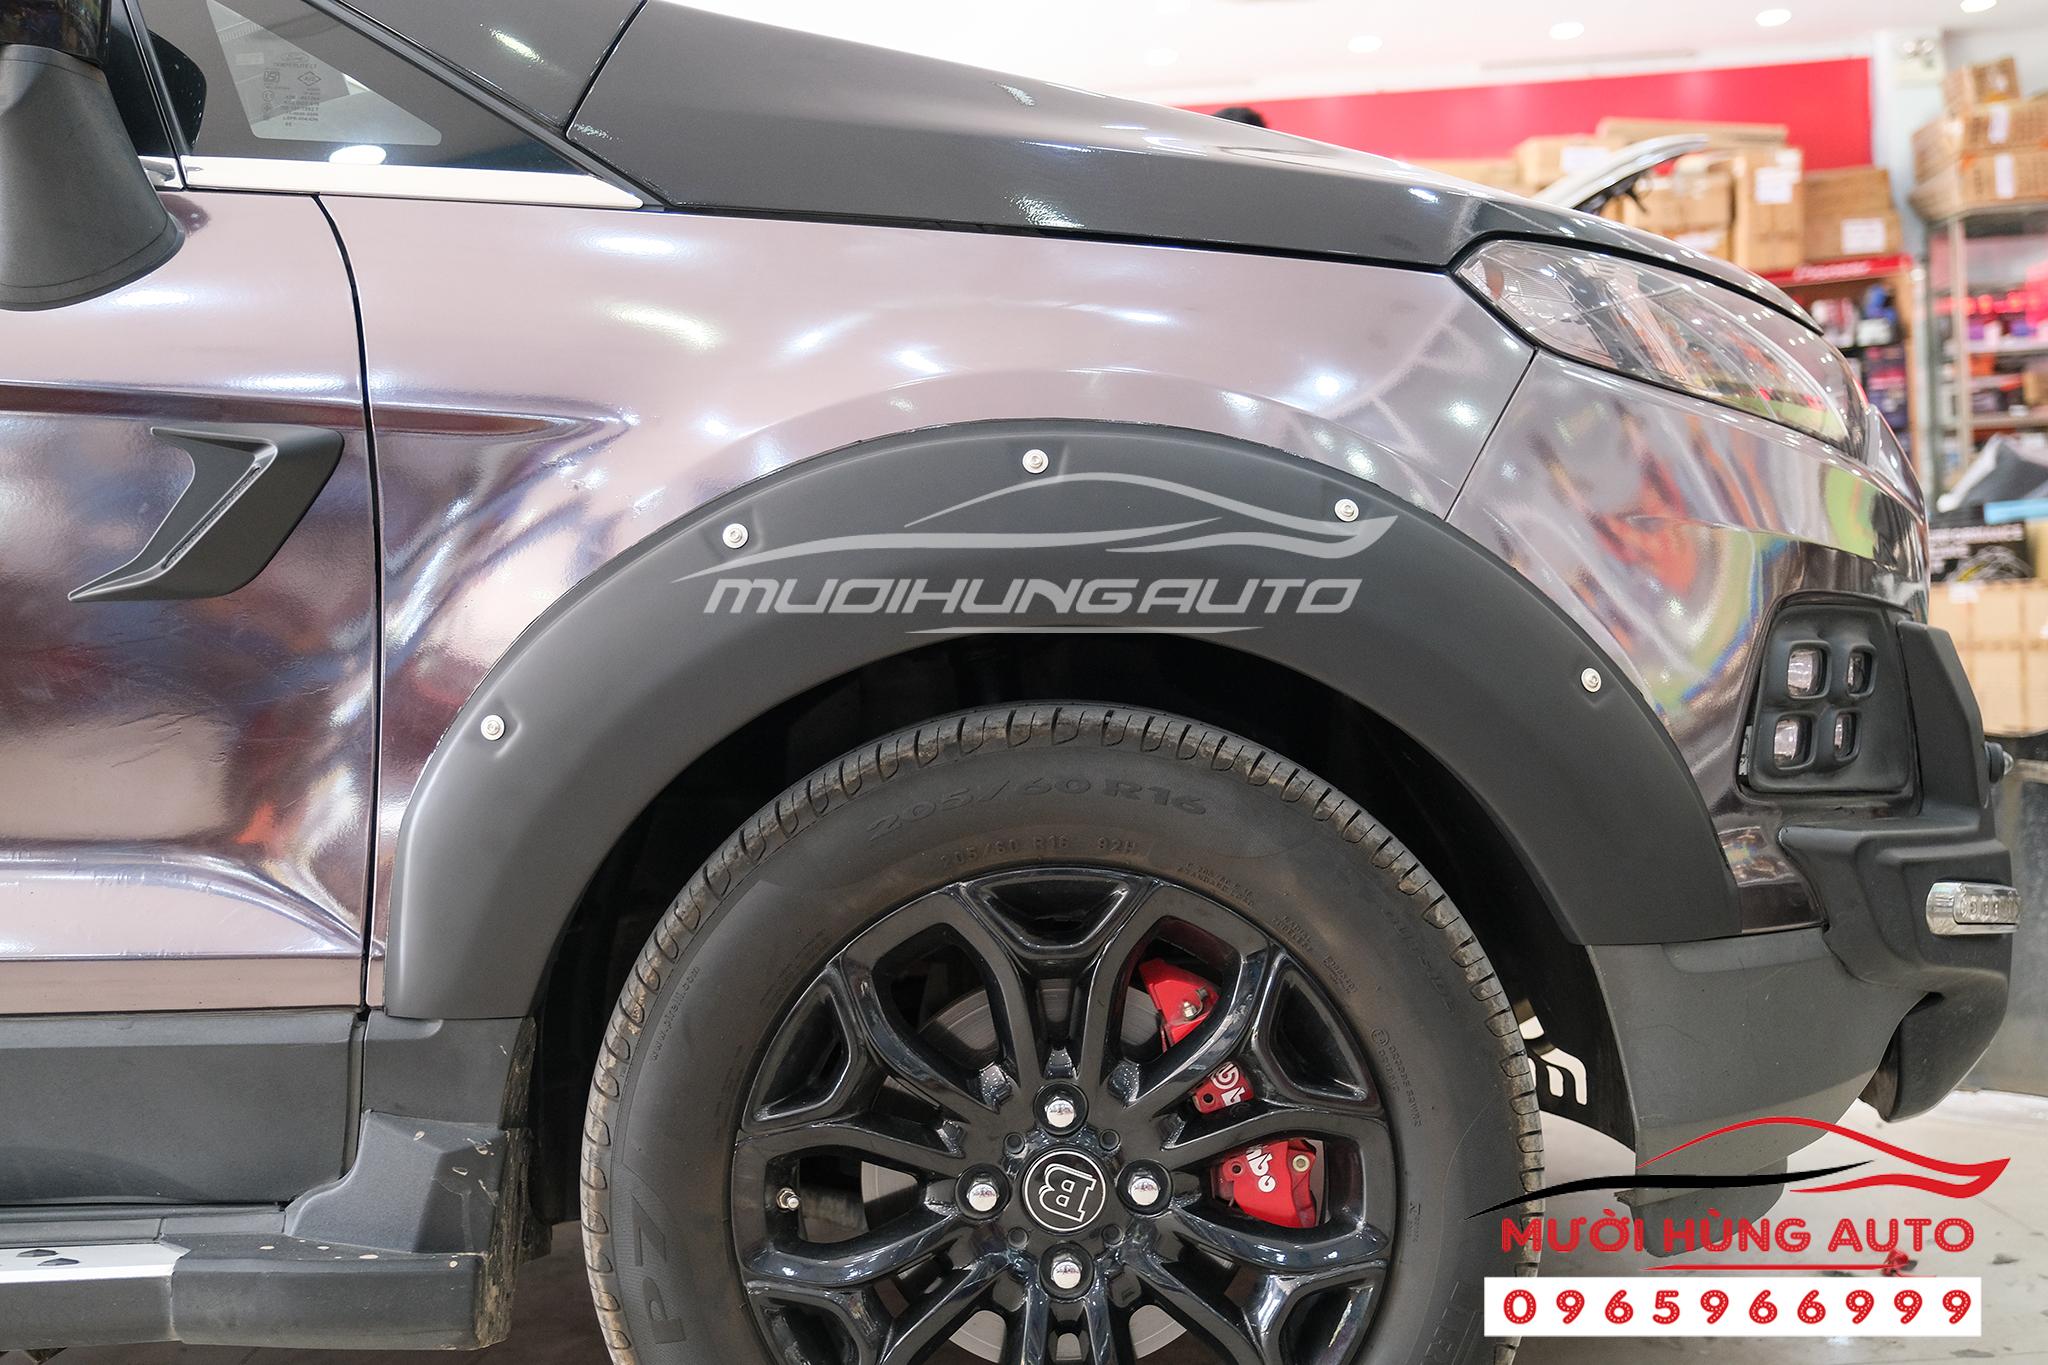 lắp Ốp cua bánh xe Ford Ecosport 2019-2020